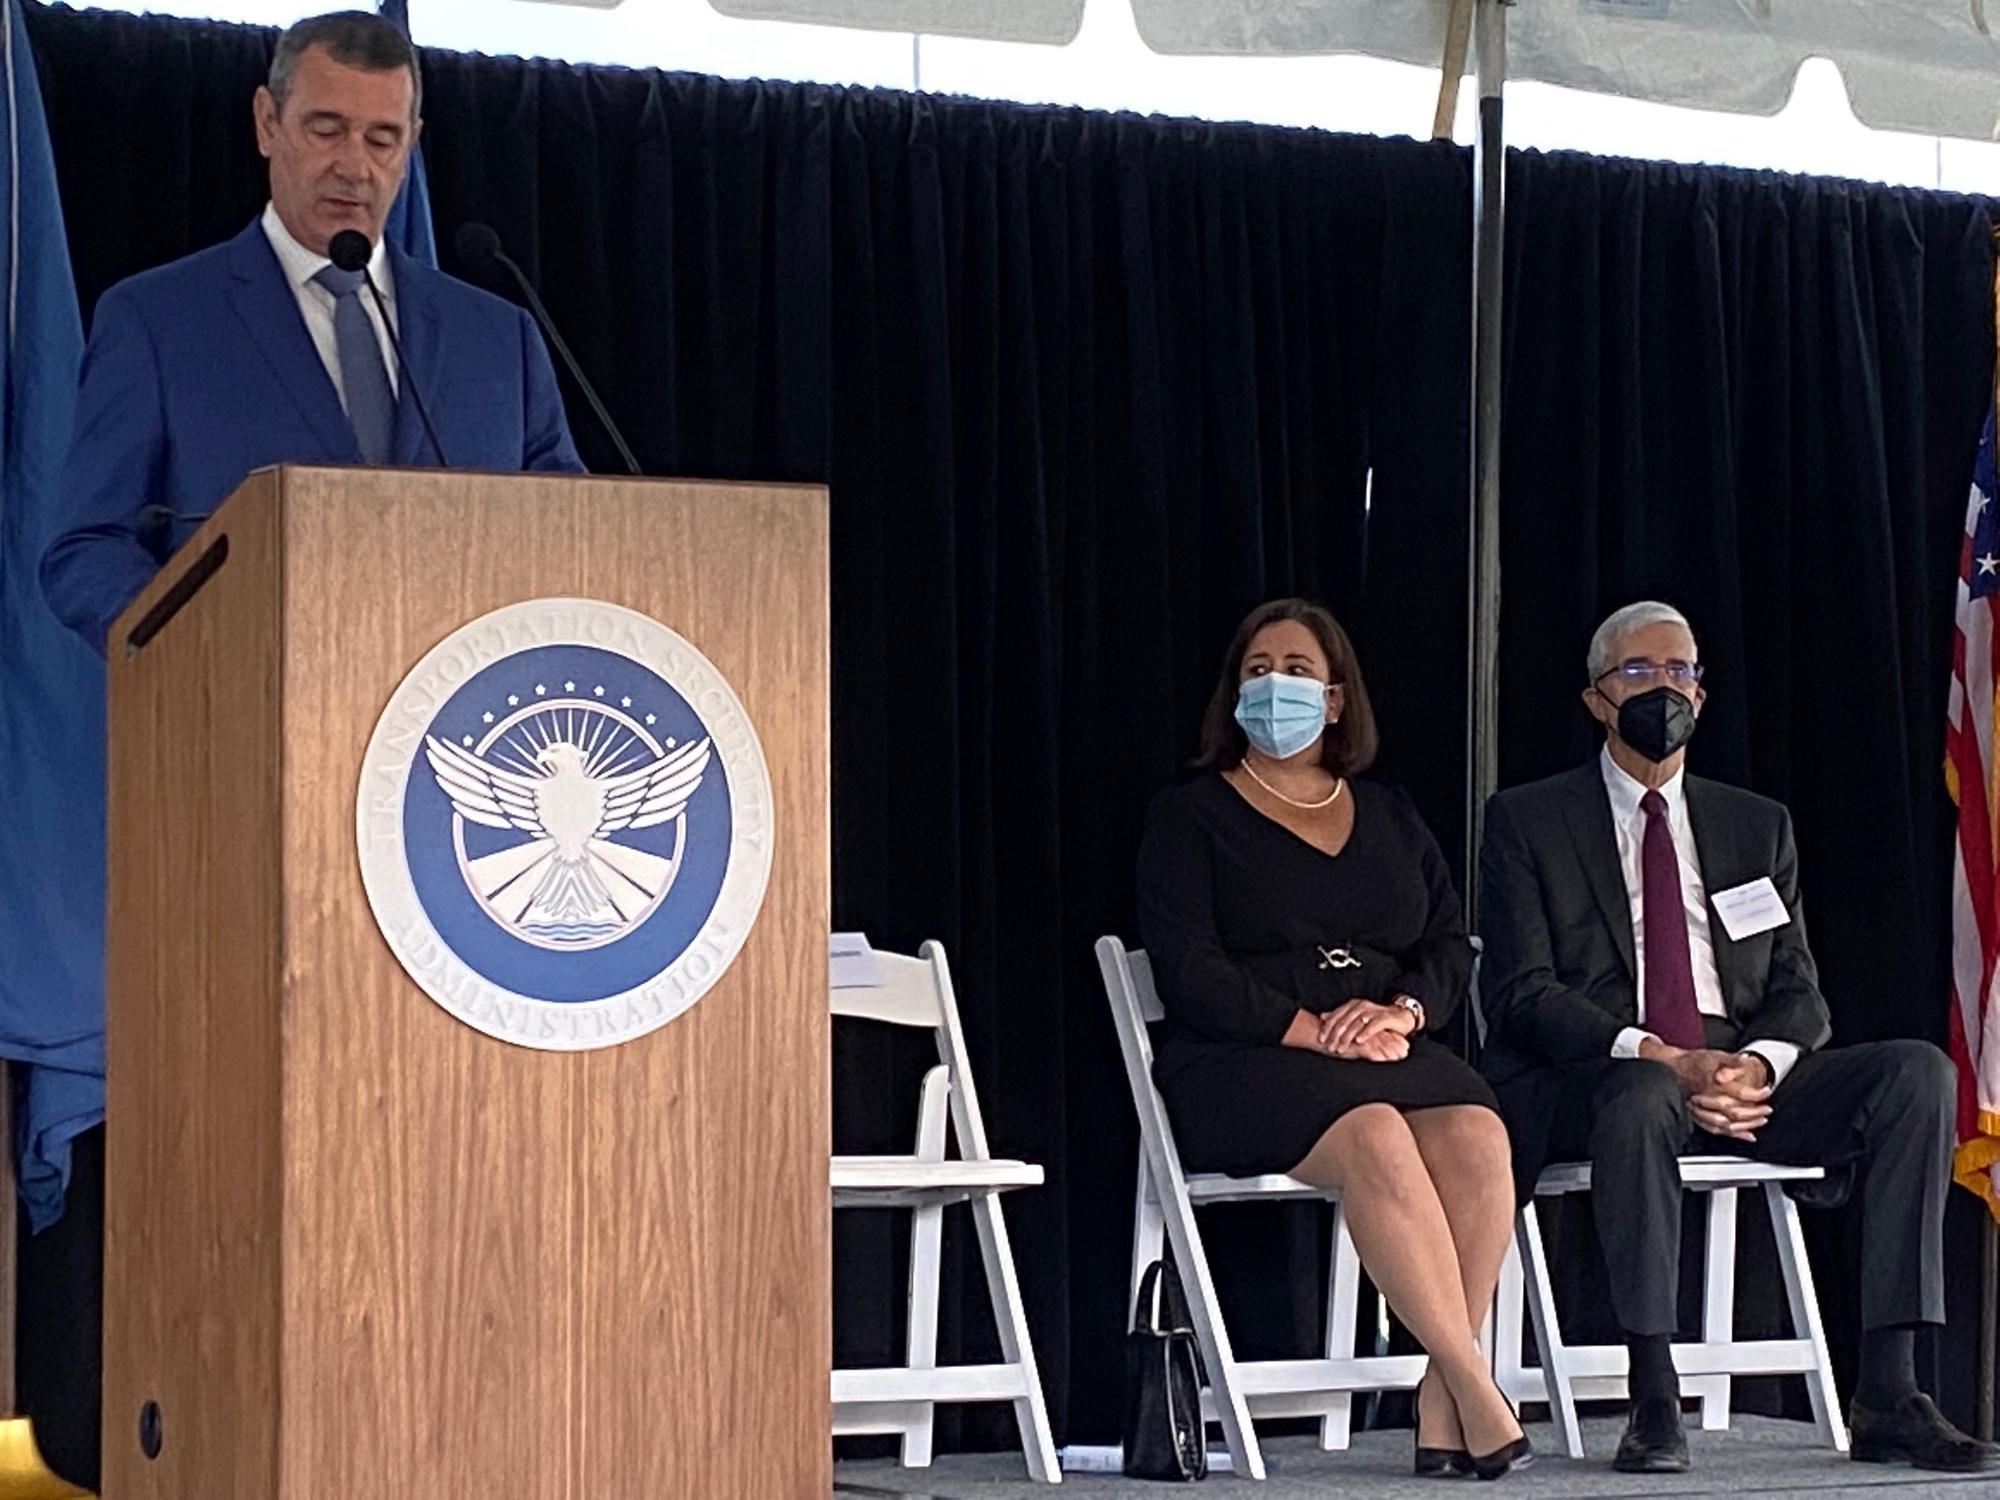 TSA Administrator David Pekoske gives remarks commemorating the 20th anniversary of the Sept. 11, 2001, terrorist attacks. (TSA photo)